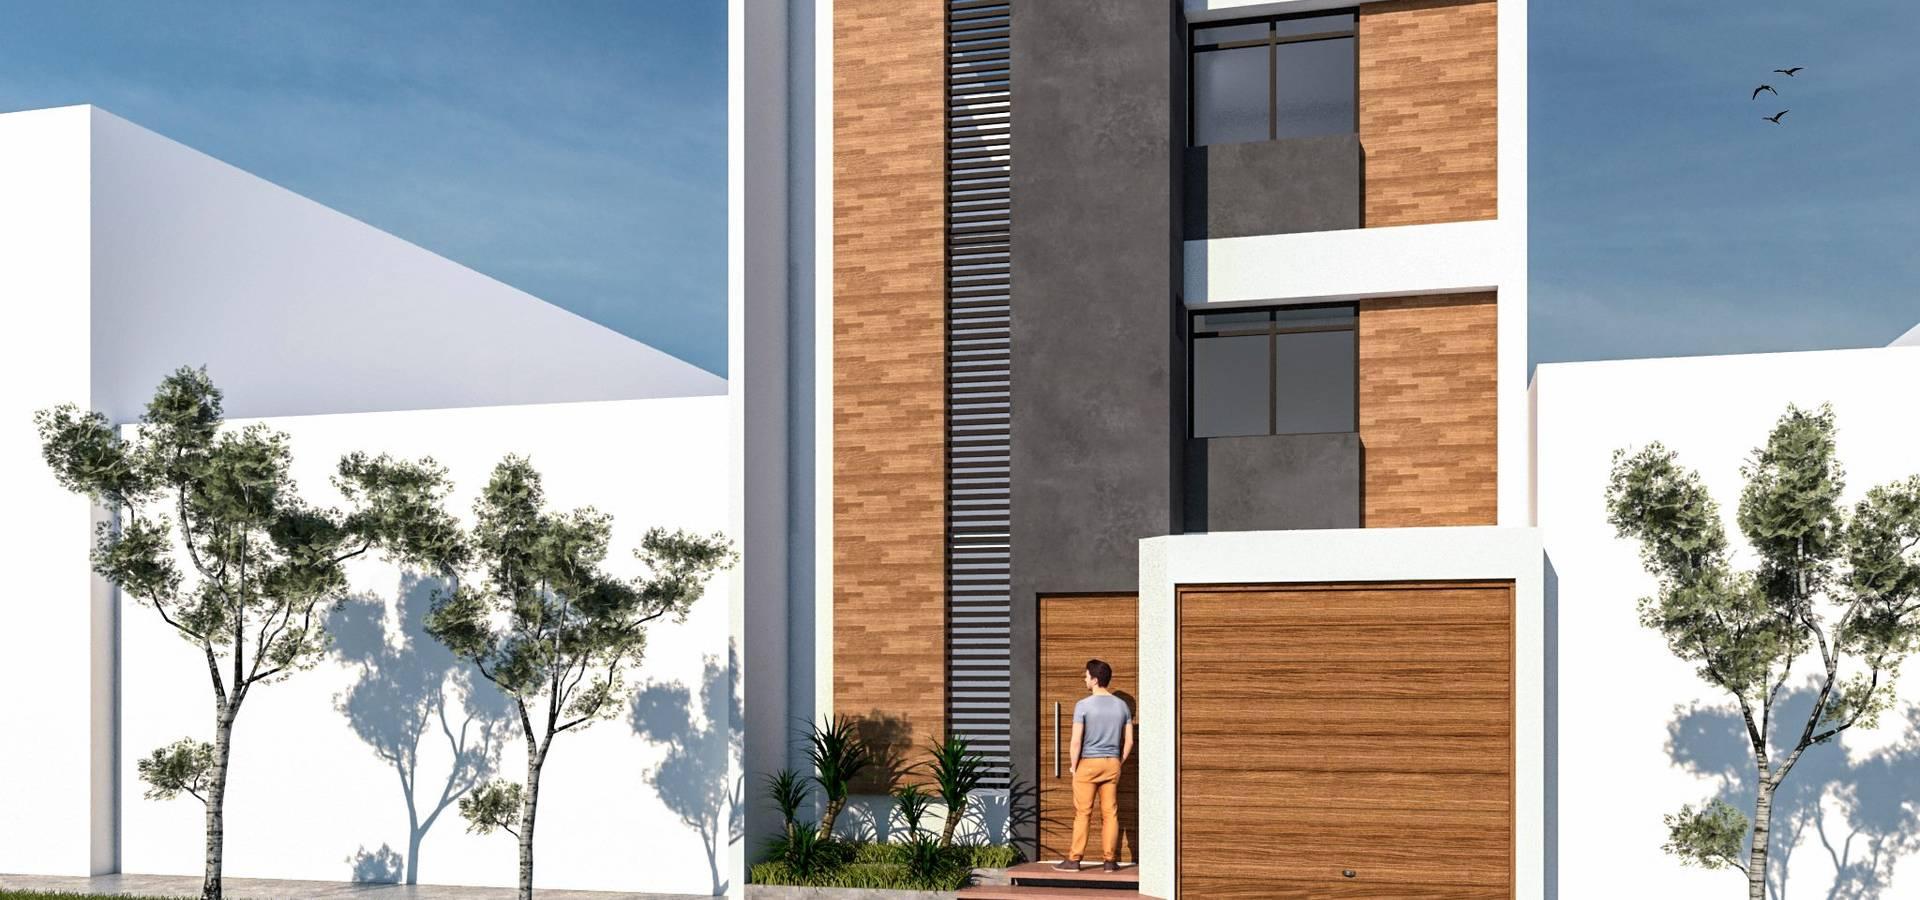 Kiuva arquitectura y diseño